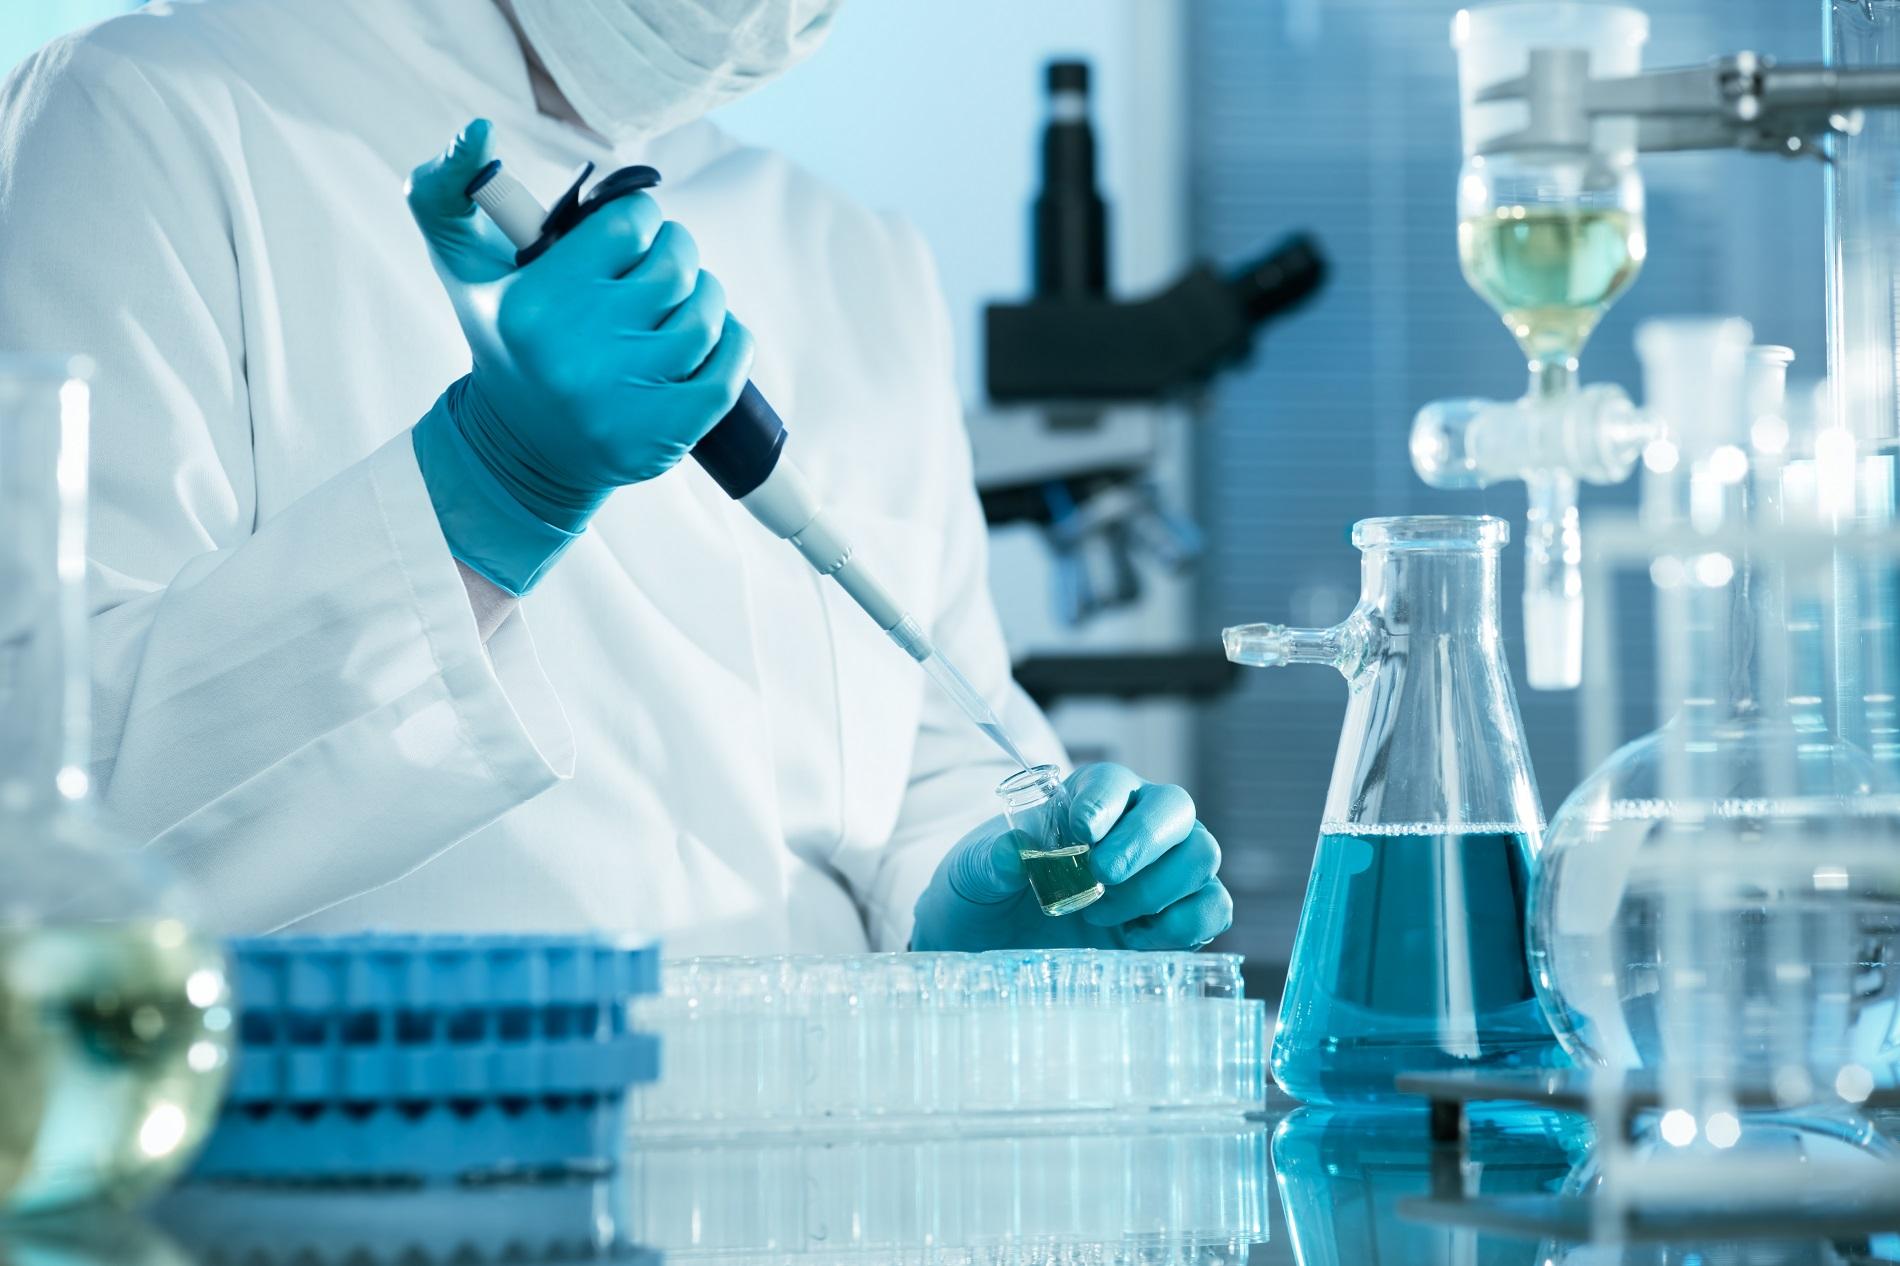 Silver Lining for Biotechnology ETFs After Pfizer Calls off Allergan Deal